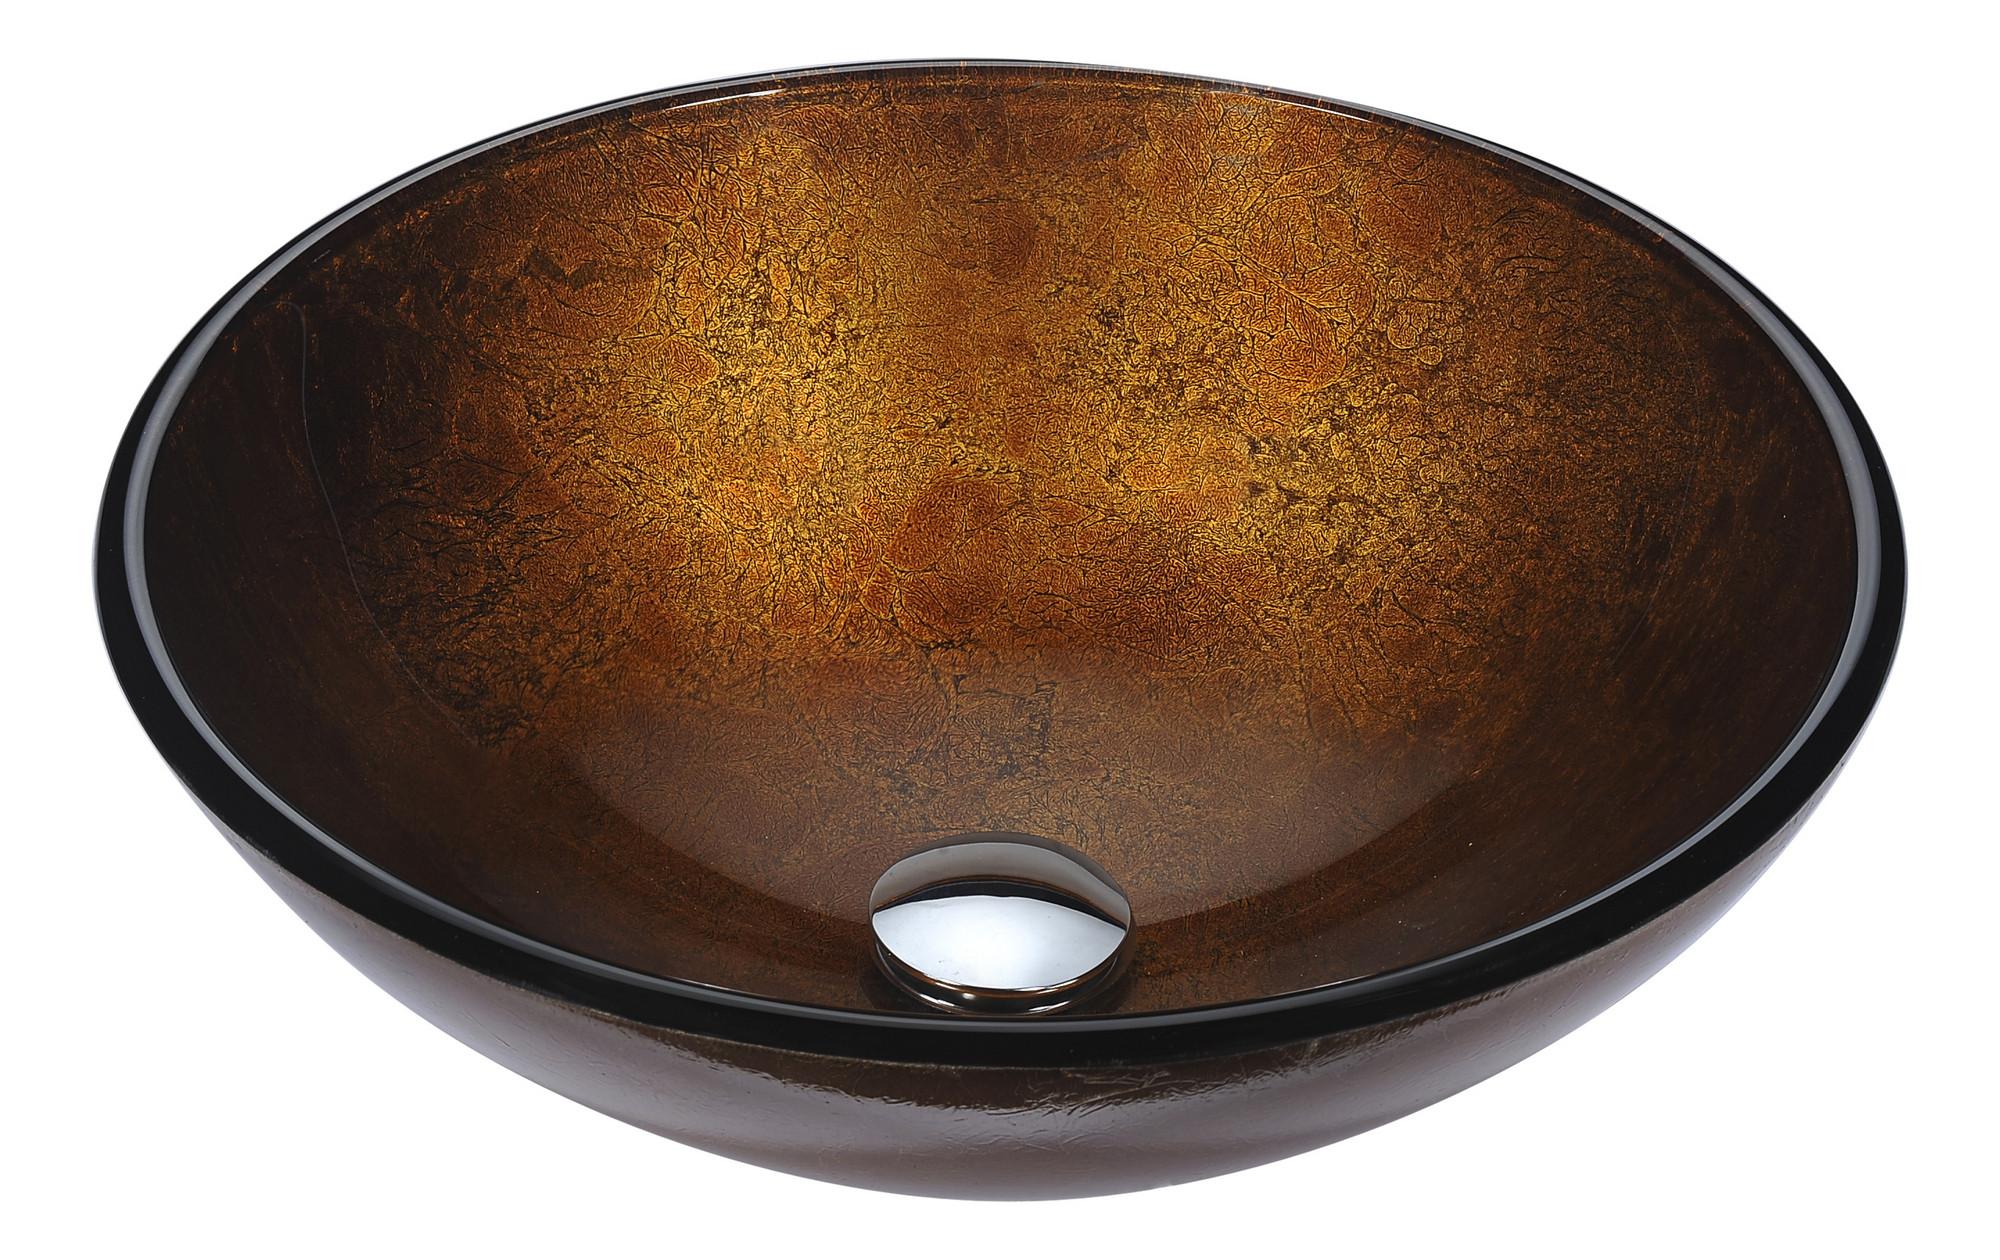 ANZZI LS-AZ292 Posh Series Round Deco-Glass Vessel Sink In Amber Gold